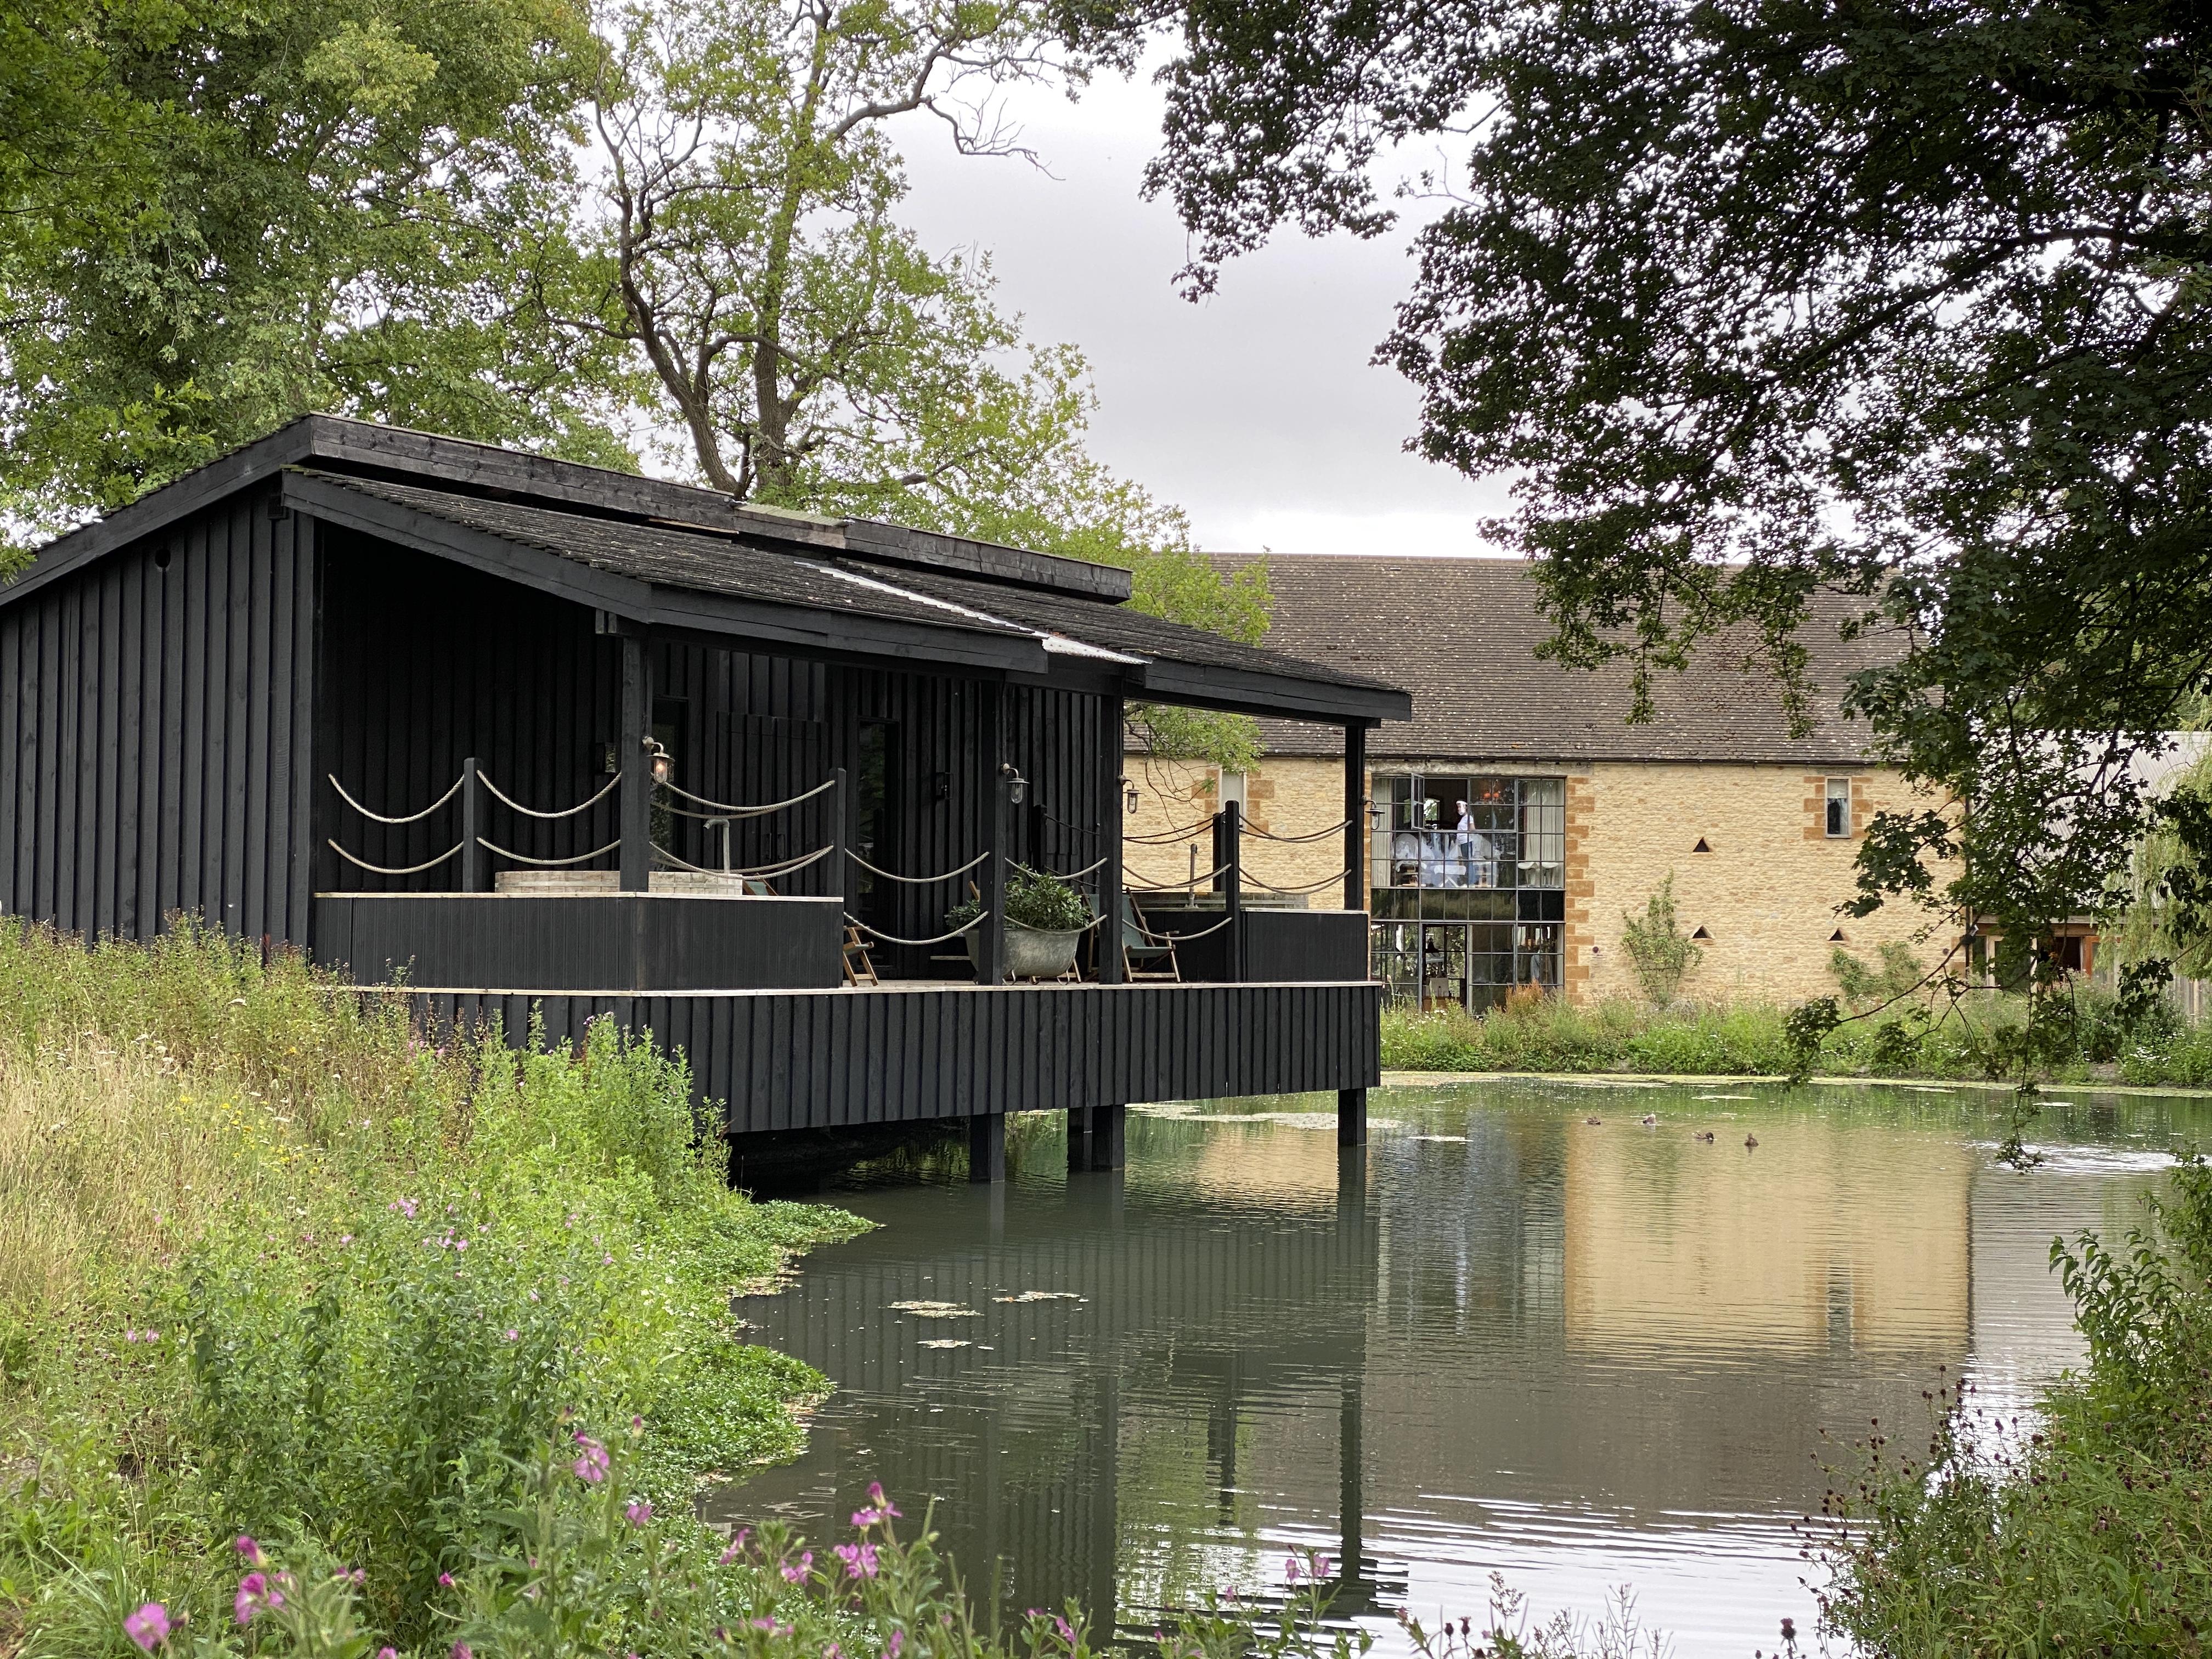 Lakeside accommodation on stilts at Soho Farmhouse